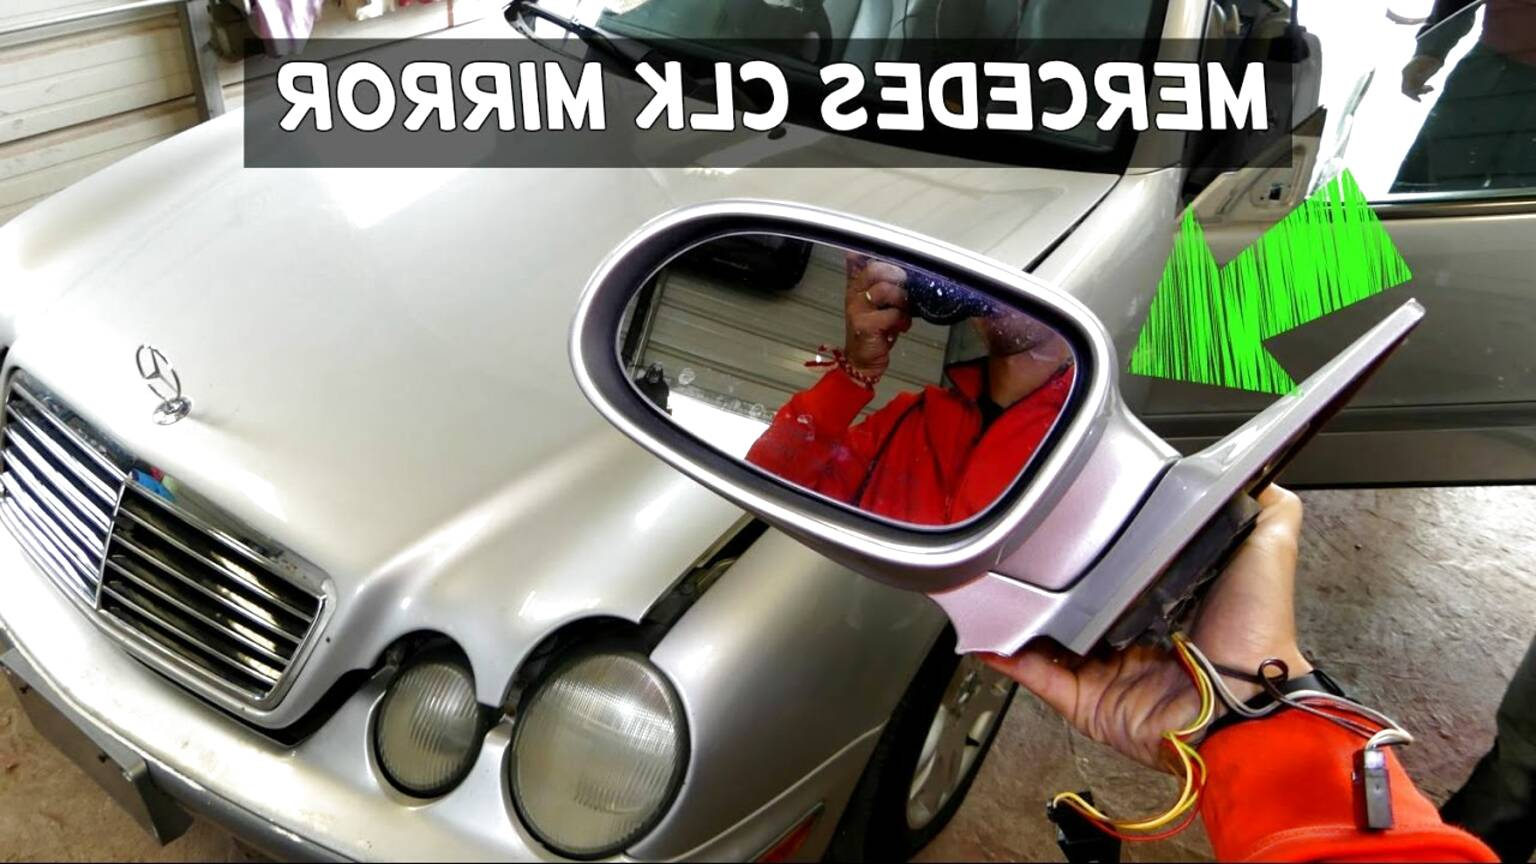 Rear View Mirror Light Clk W209 Ry 2003-2009 Left 2308200721